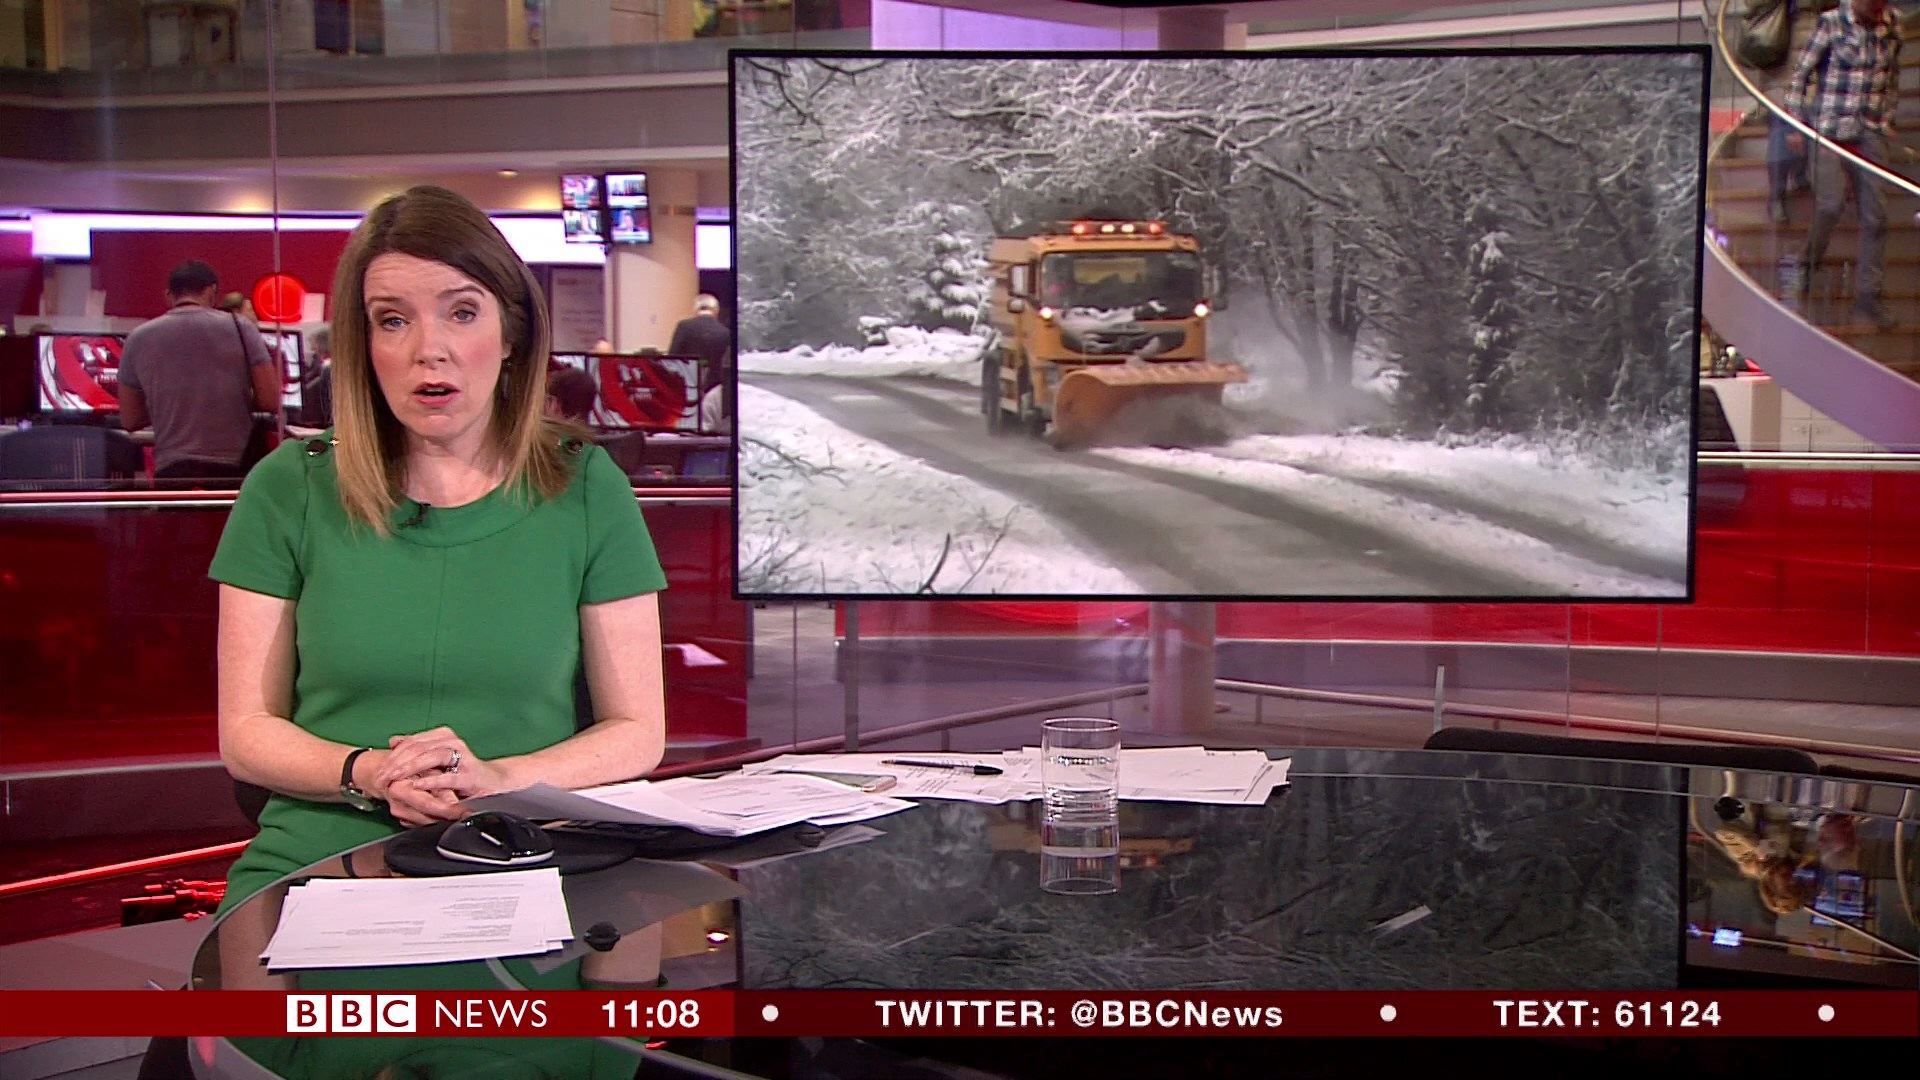 61842122_bbc-newsroom-live_20180117_11001130-ts_snapshot_08-57_-2018-01-17_12-57-09.jpg